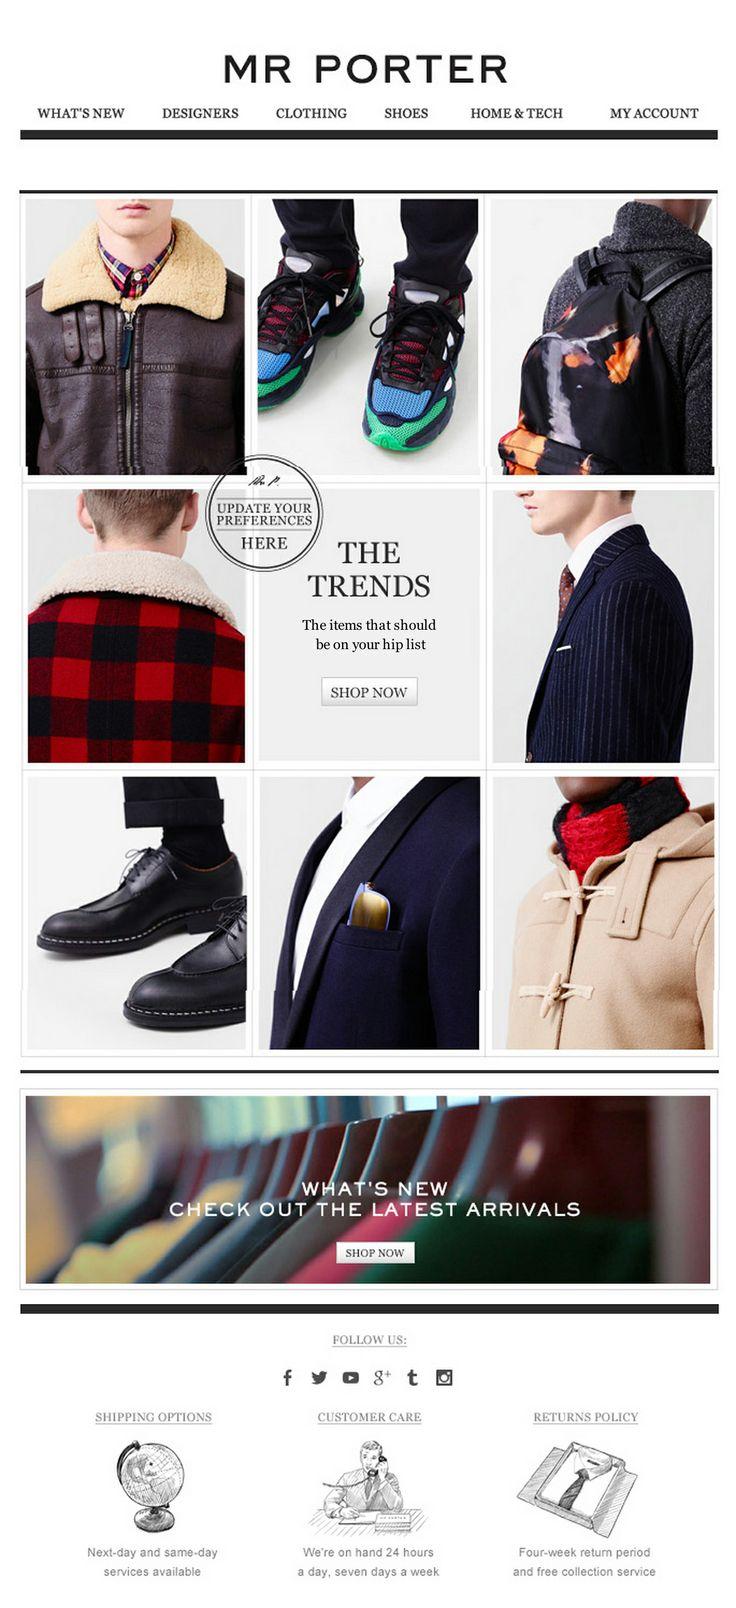 MR Porter - Trend